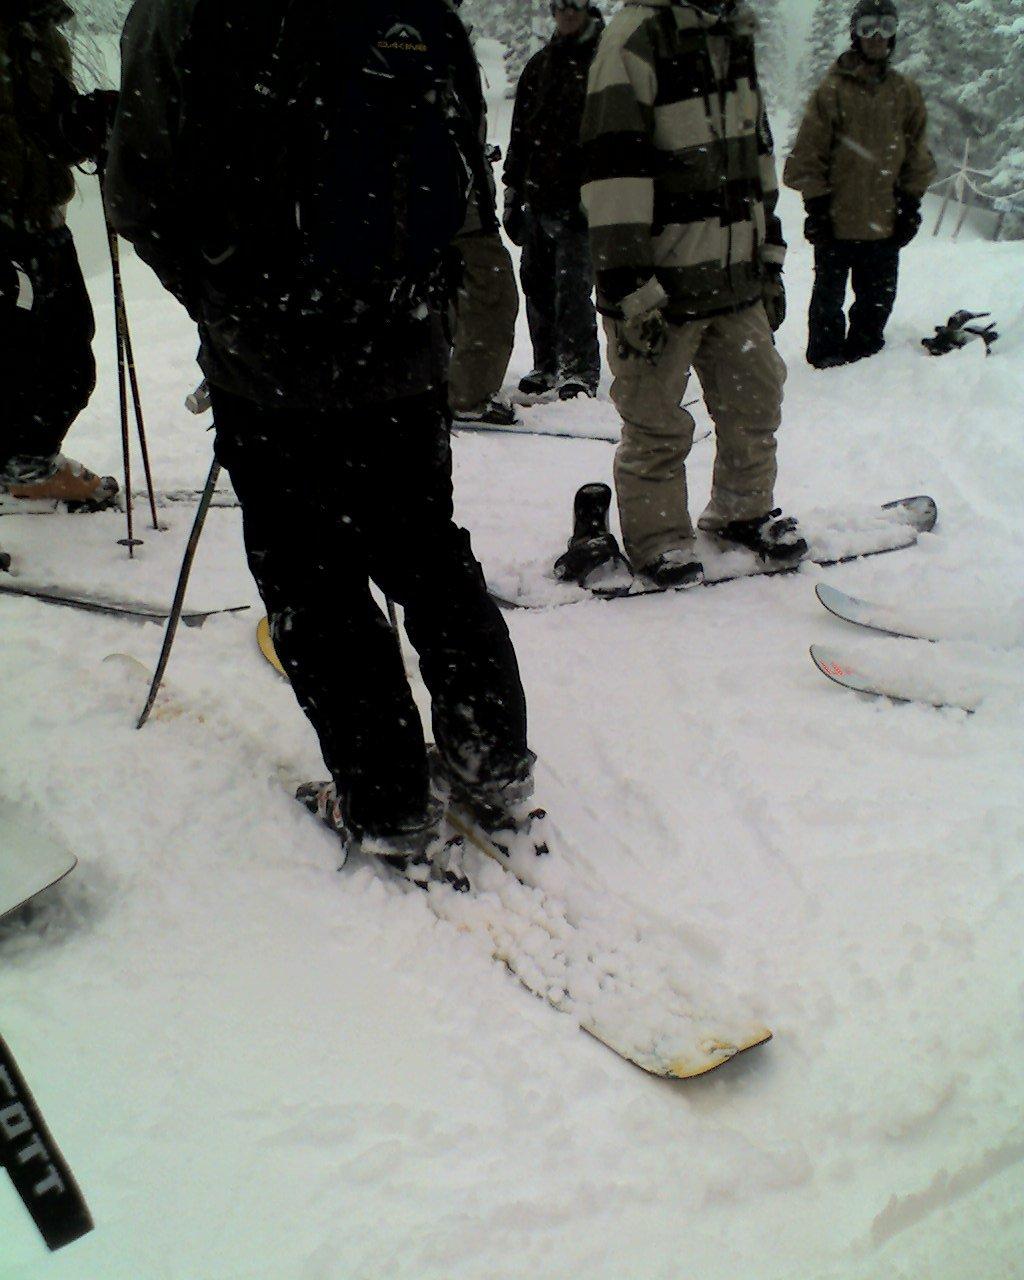 Skiing - 10 of 18